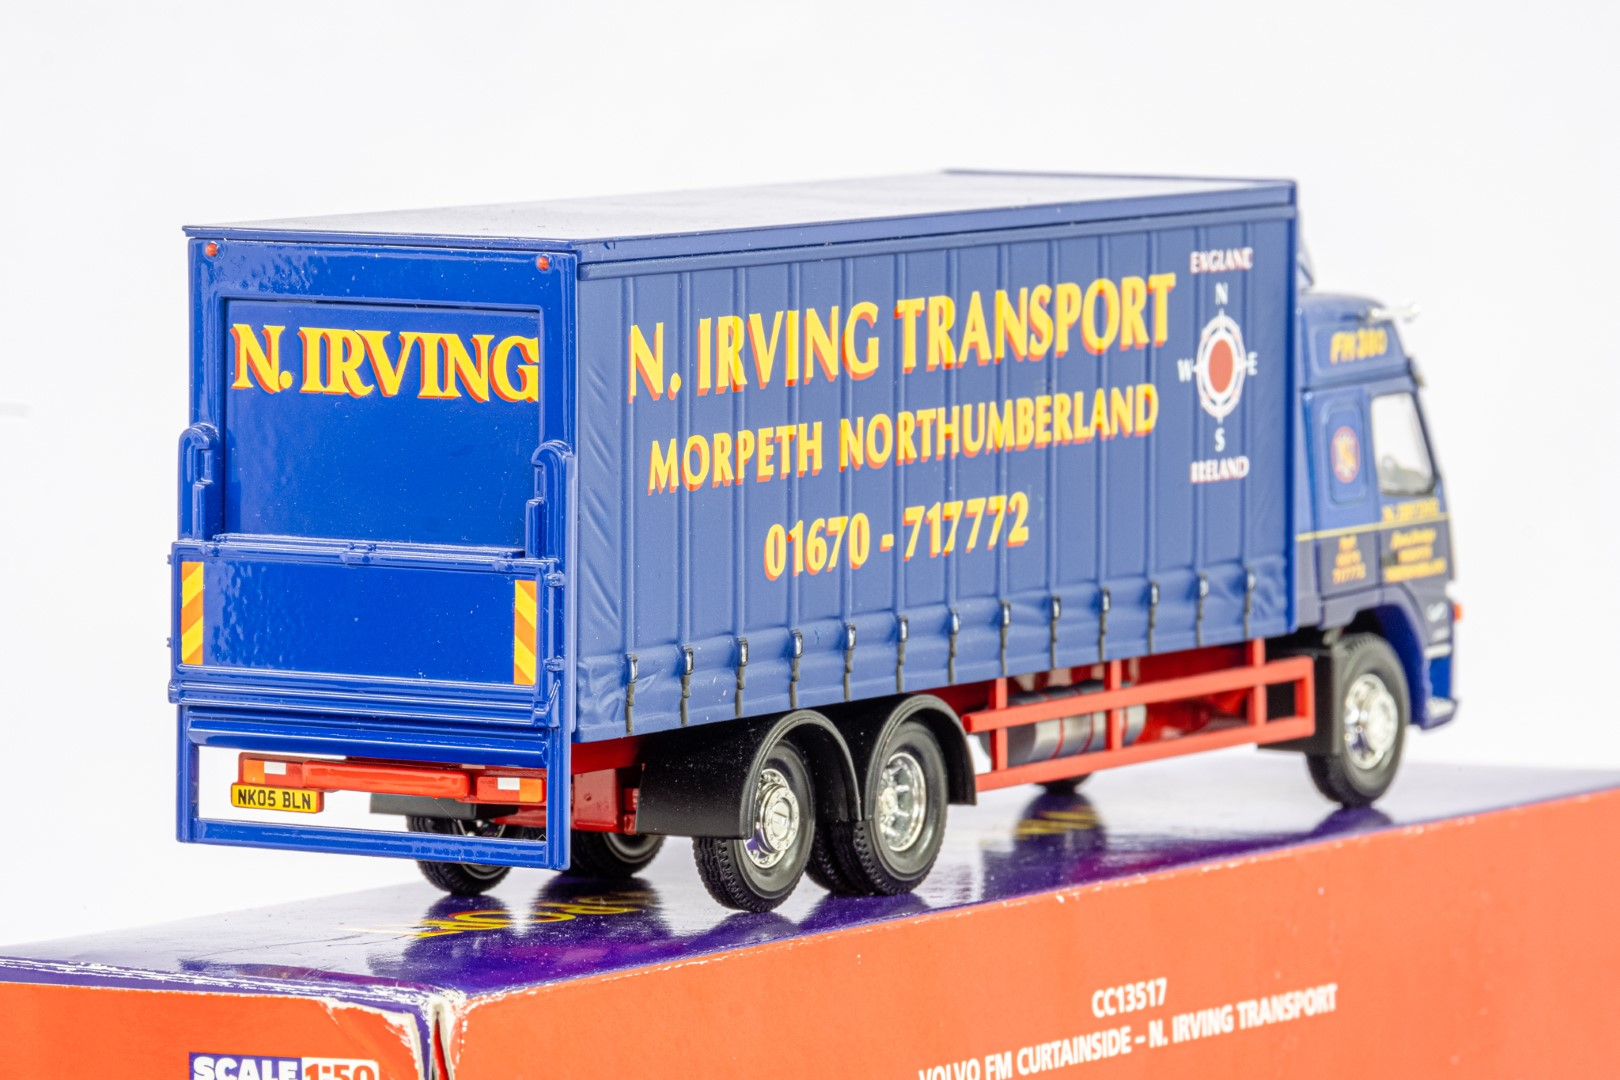 Corgi Volvo FM Curtainside - N.Irving Transport - - Image 5 of 5